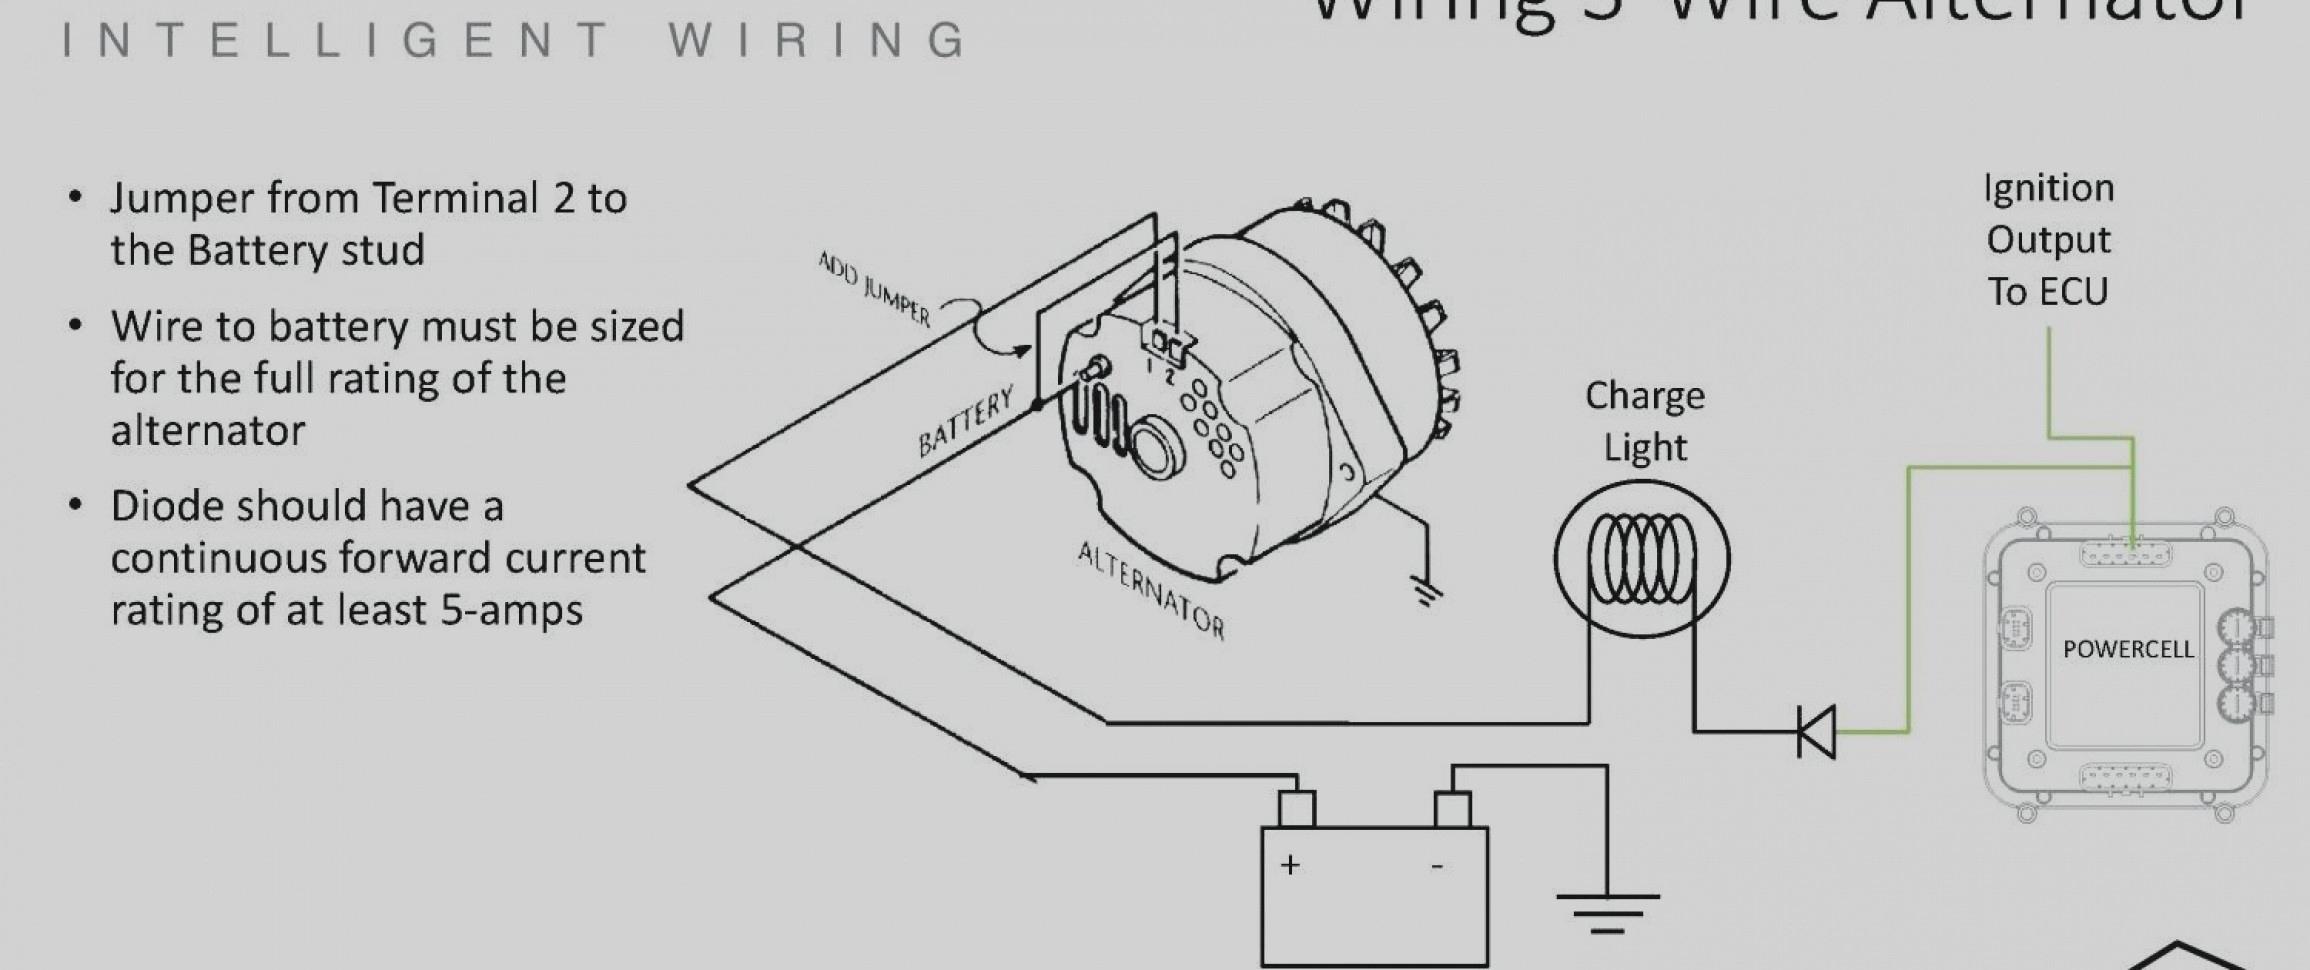 9 Inspirational Delco Remy Alternator Wiring Diagram Pictures - Delco Remy Alternator Wiring Diagram